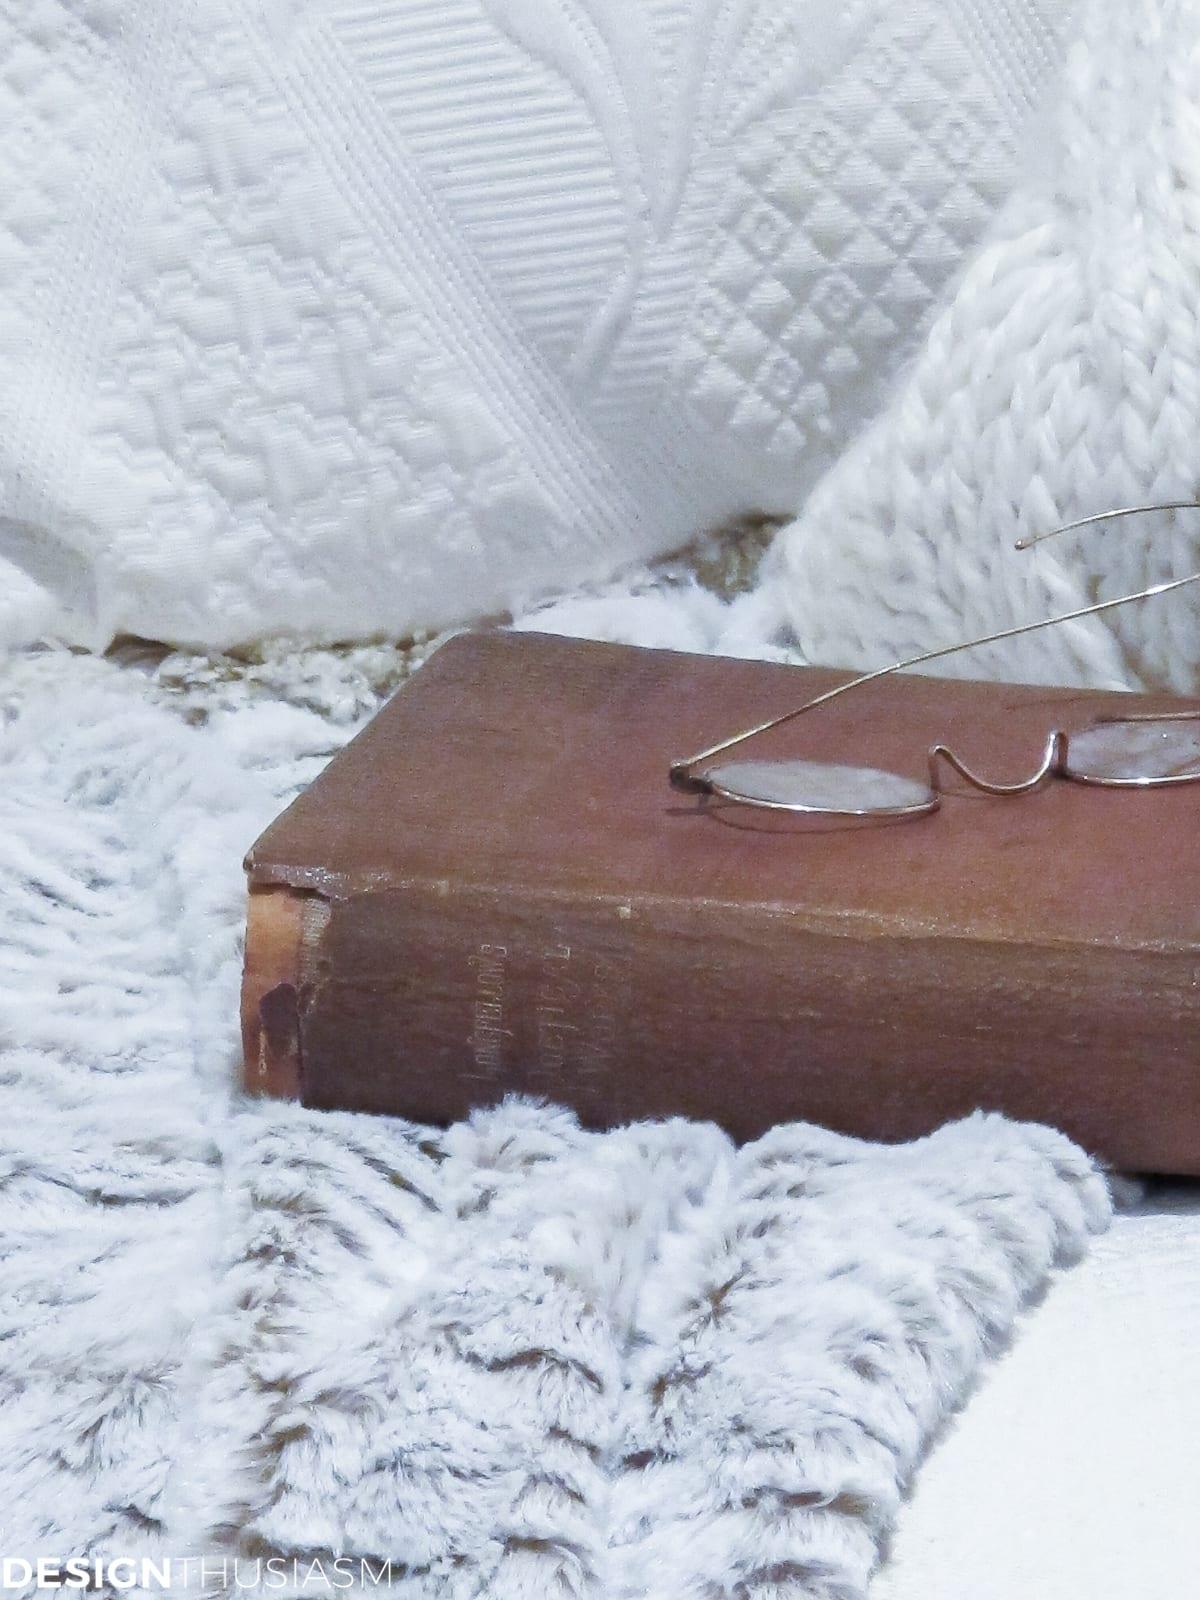 Cozy Homes: 9 Ways to Add Winter Warmth to Your Home | Designthusiasm.com